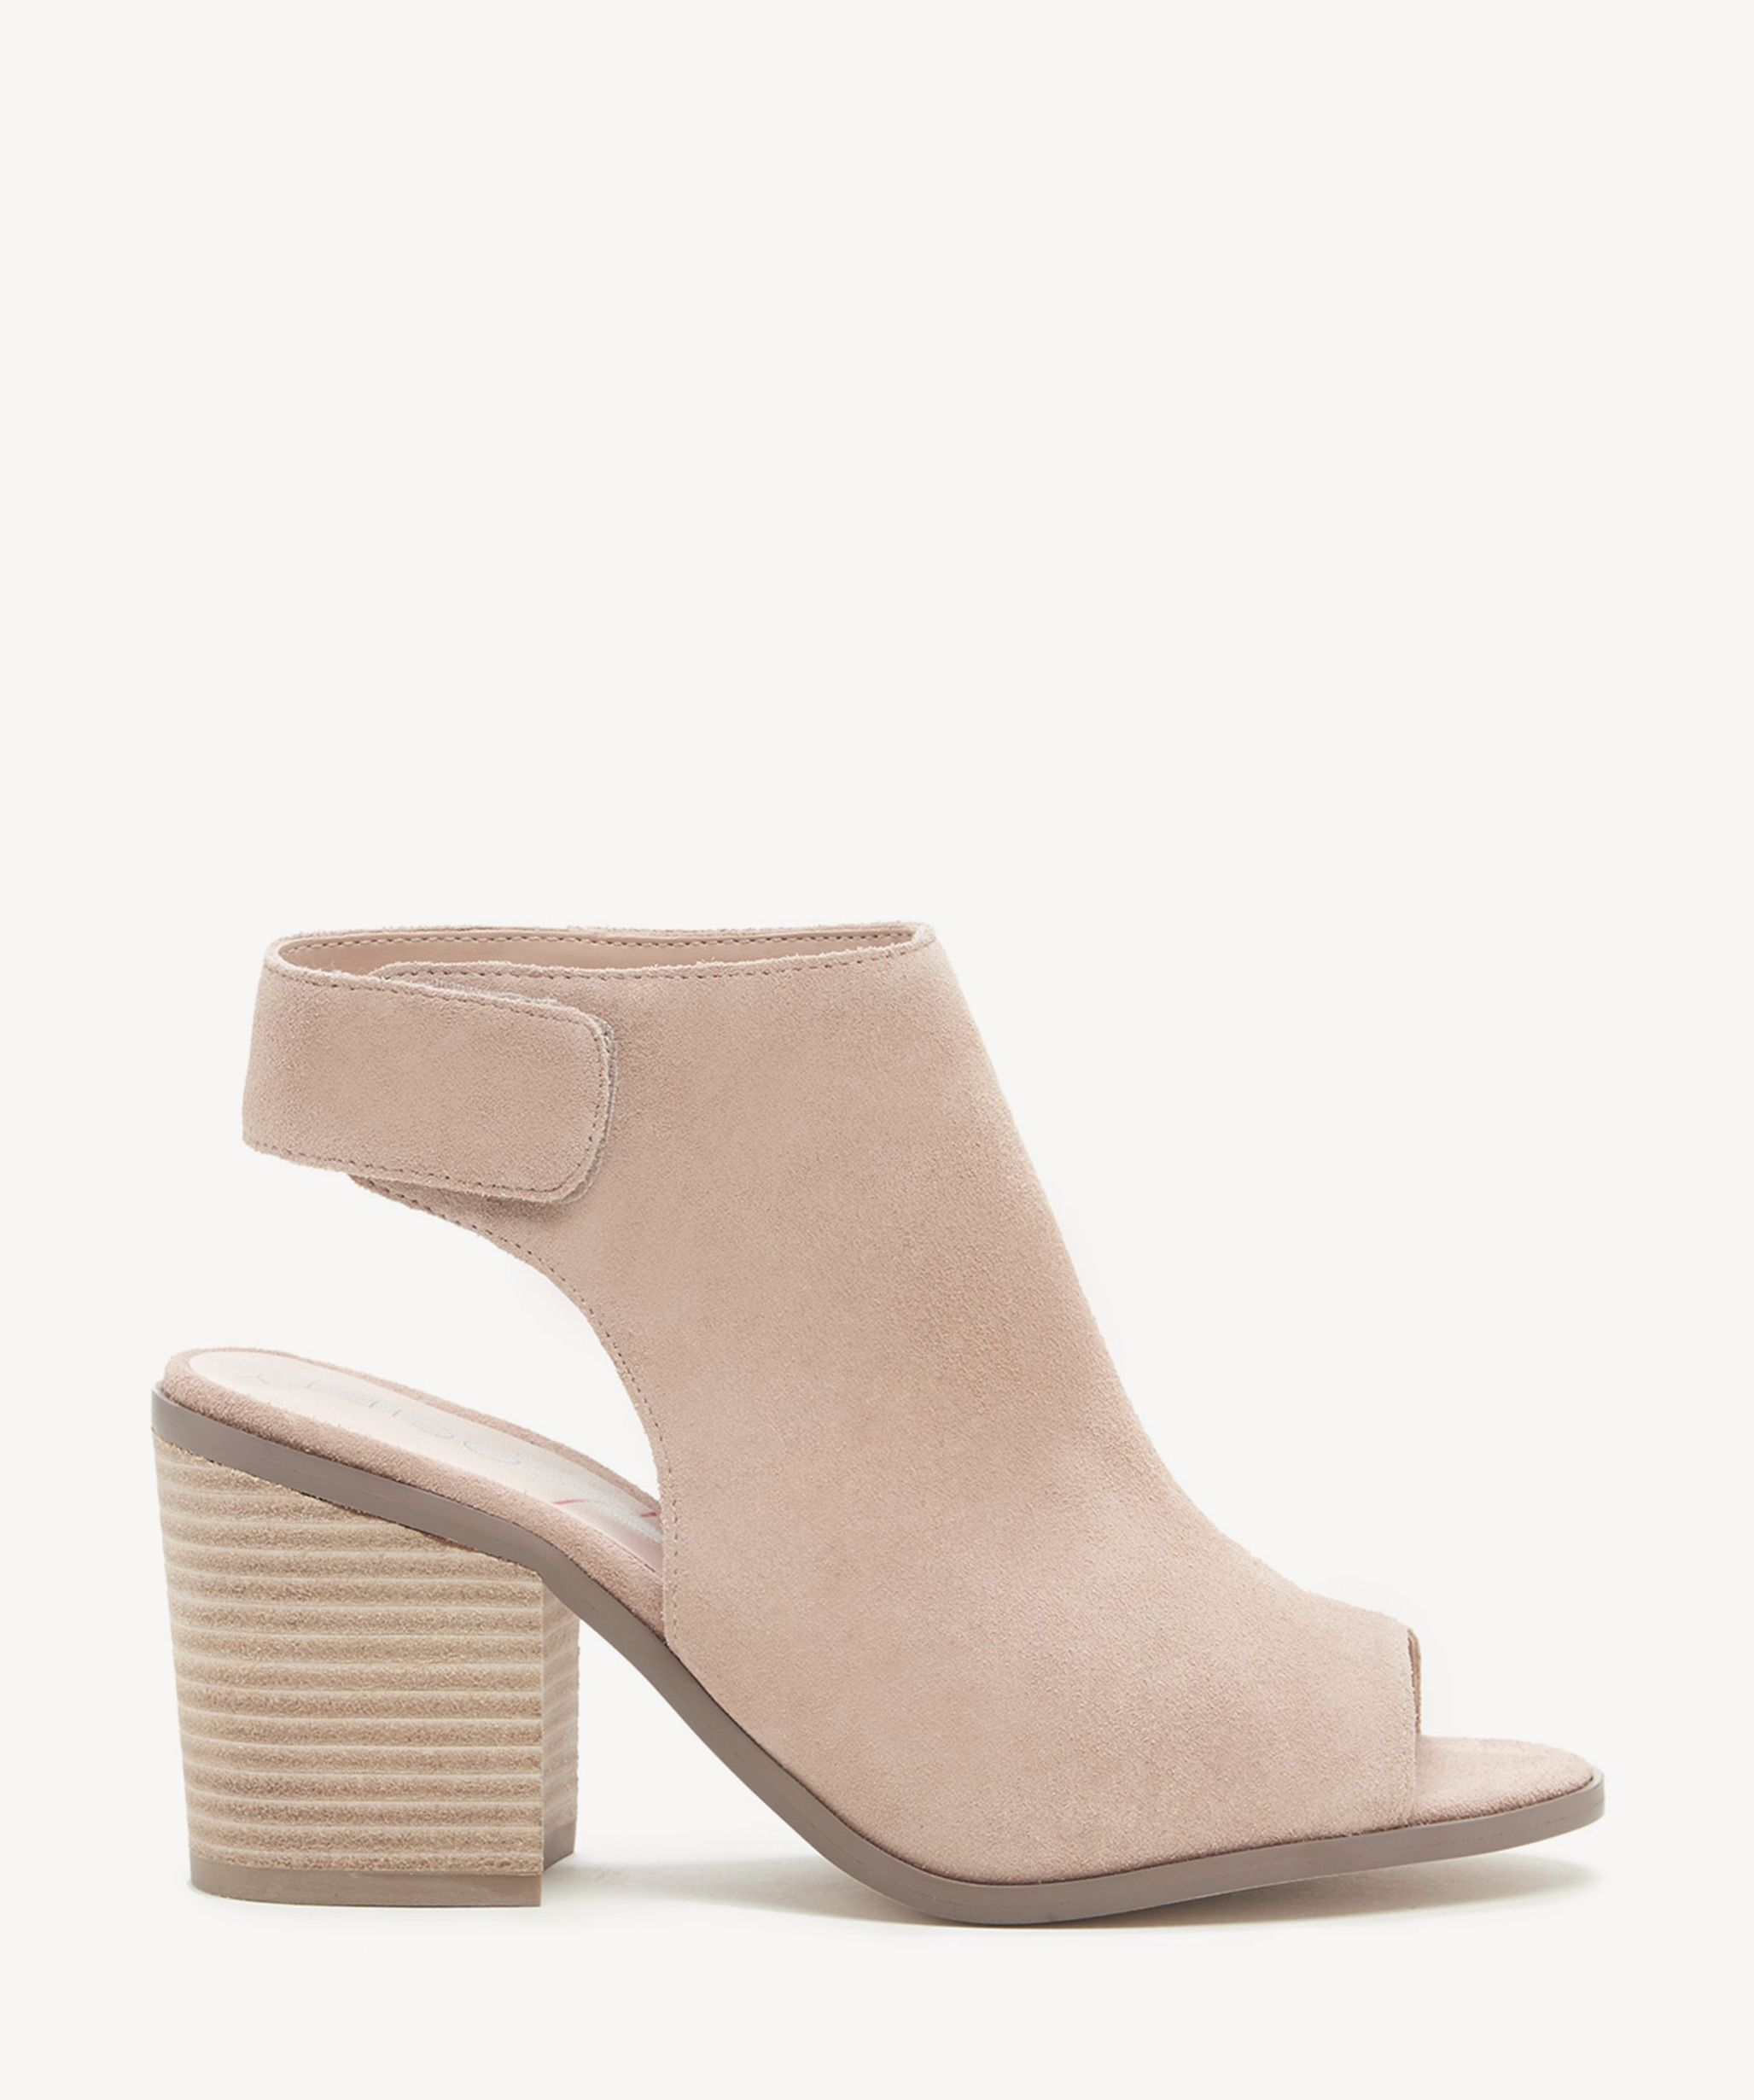 0887cce3323 Sole Society Jagger Block Heels Sandals Caramel